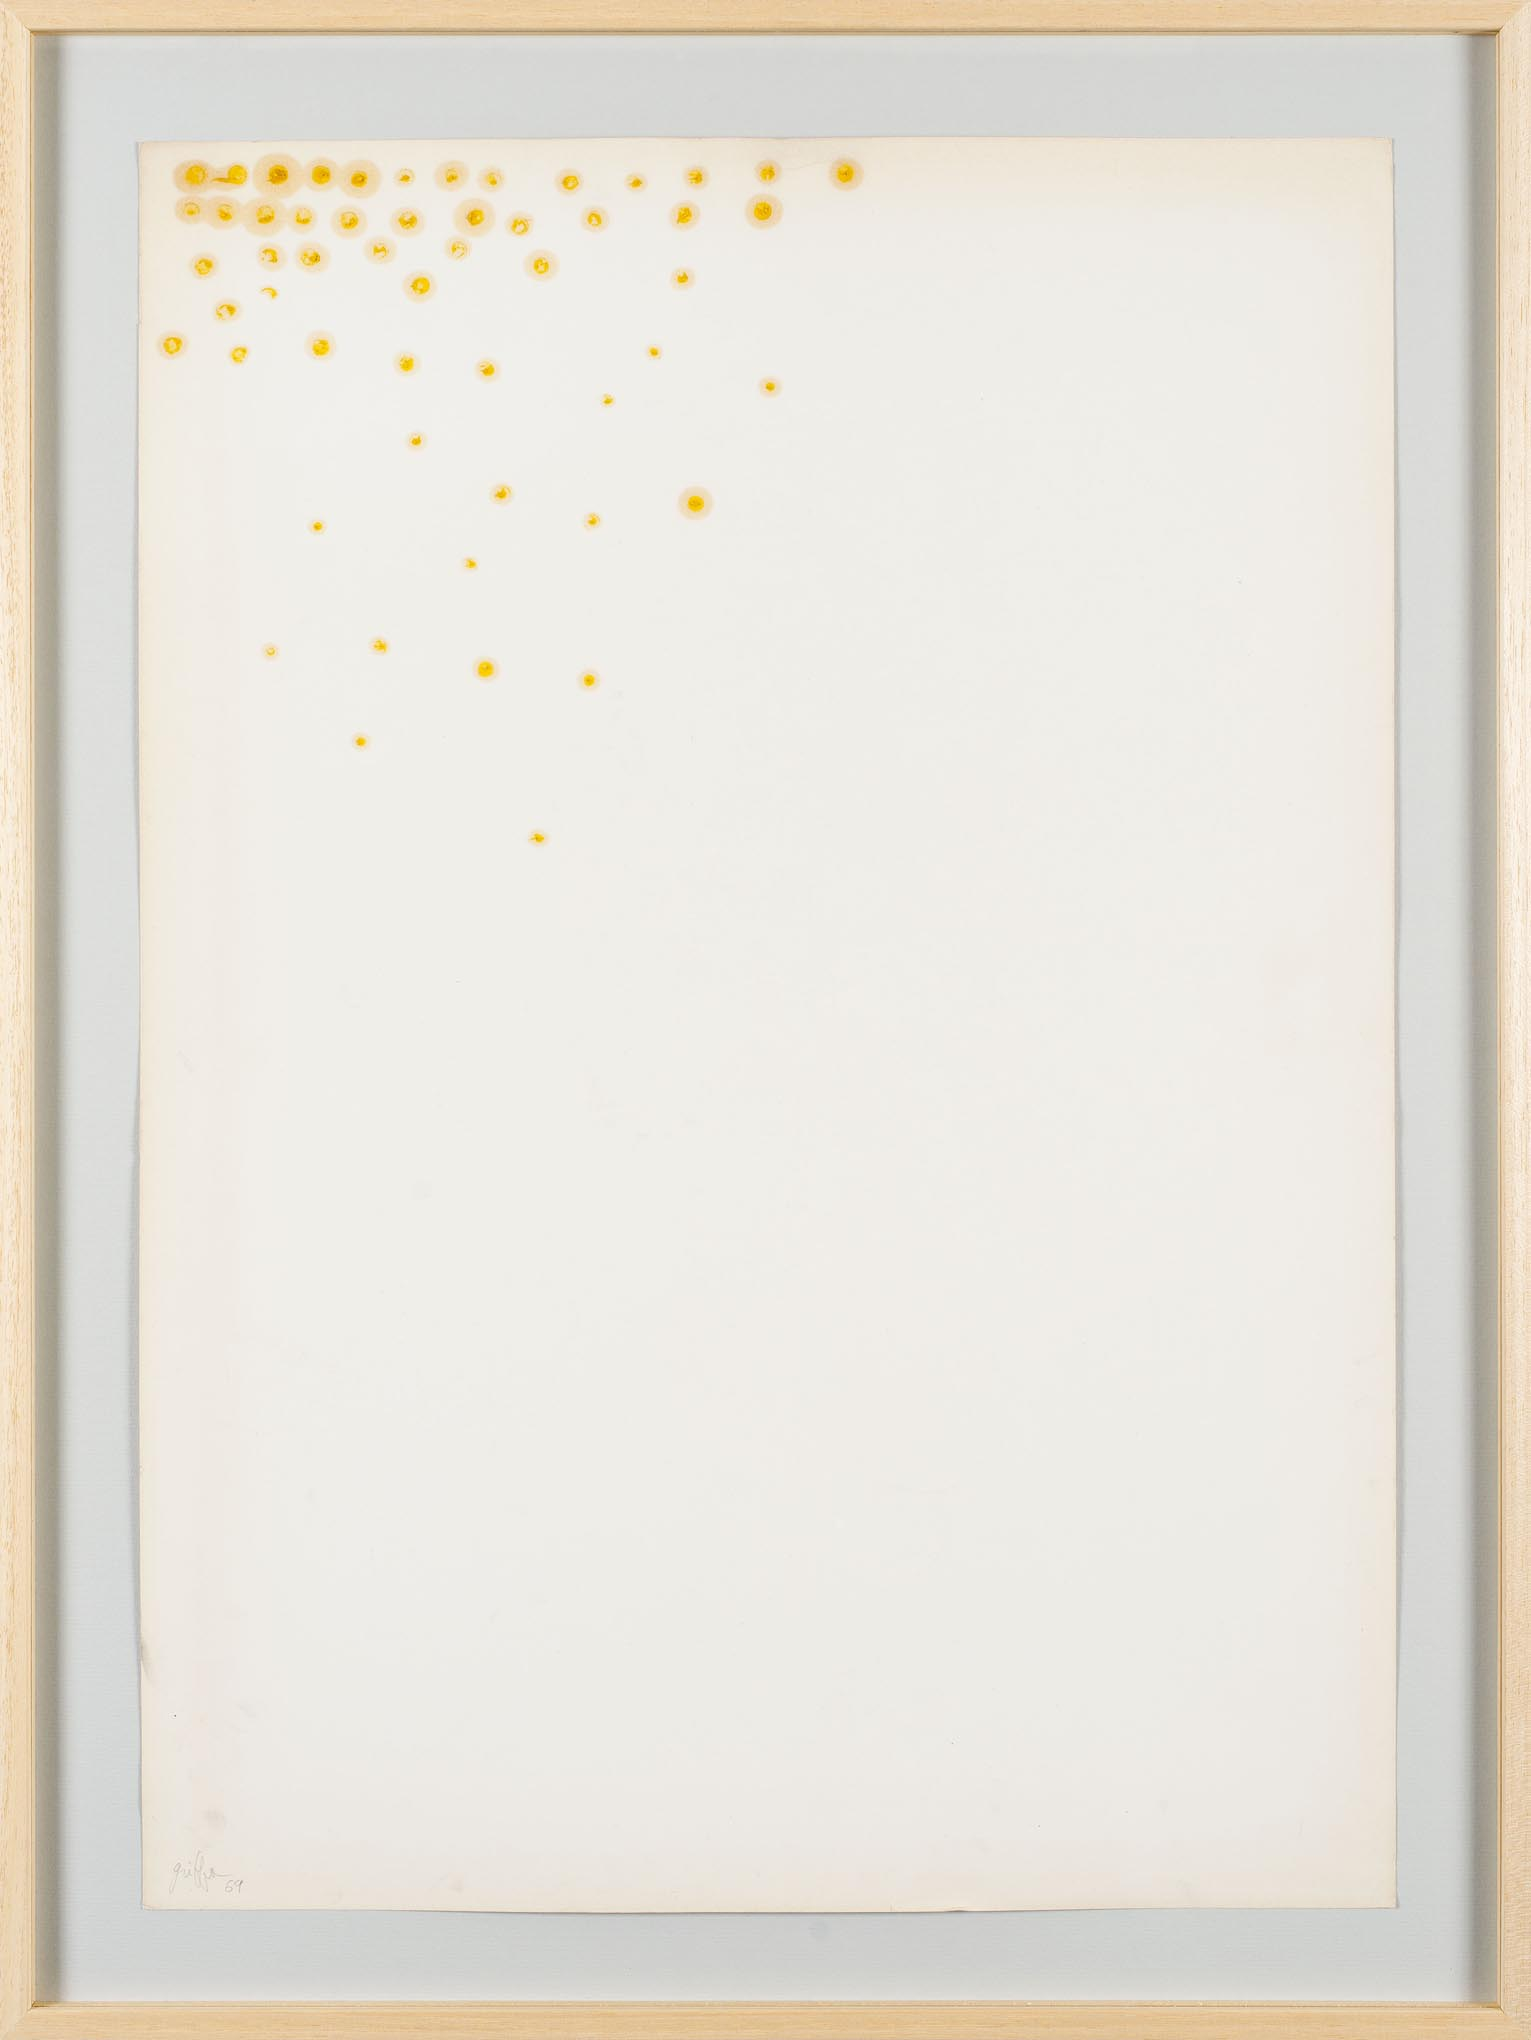 Giorgio Griffa Paper, 1969; Courtesy the artist and Casey Kaplan Gallery, New York